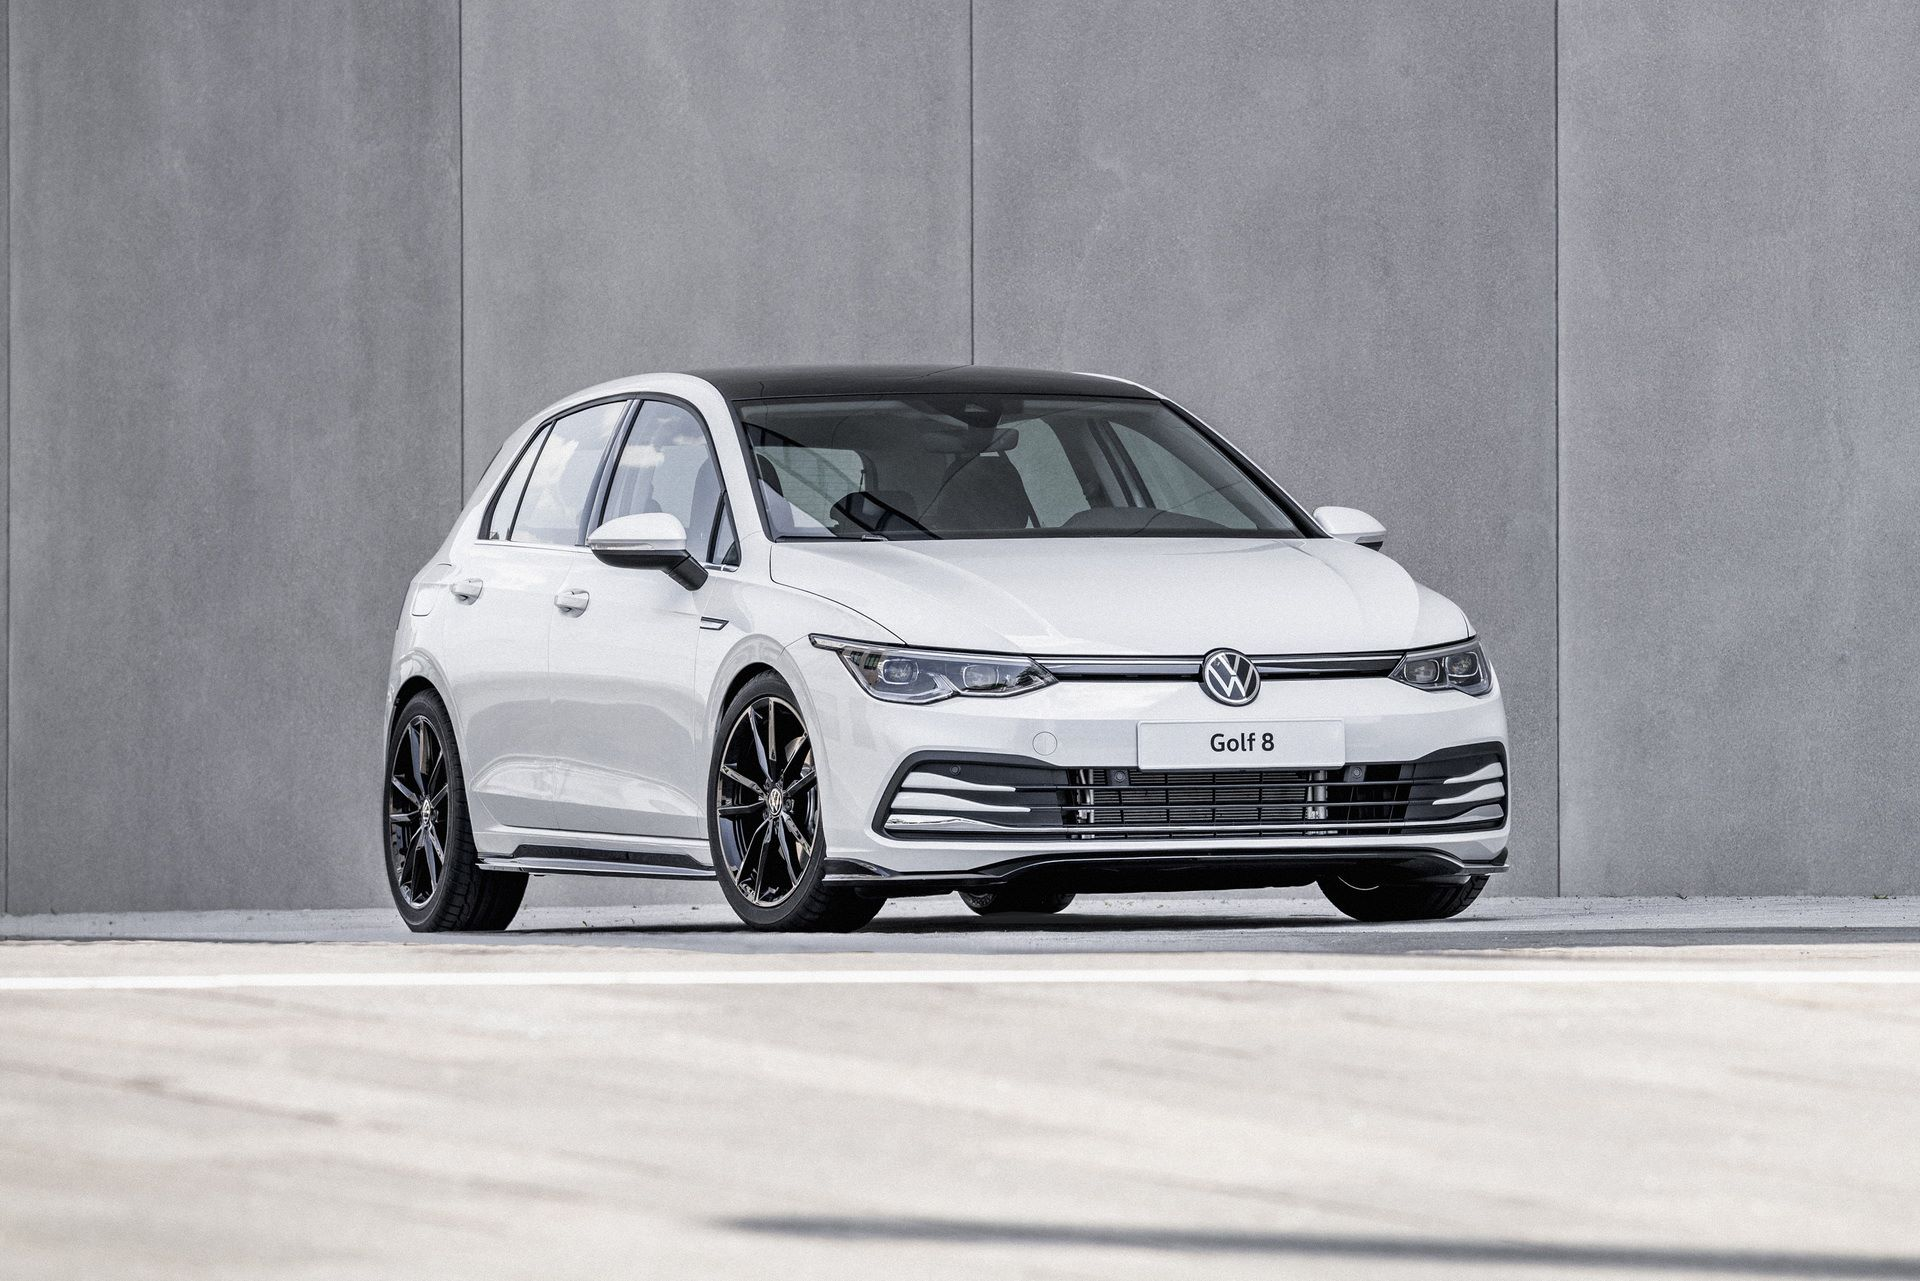 Volkswagen-Golf-8-by-Oettinger-1